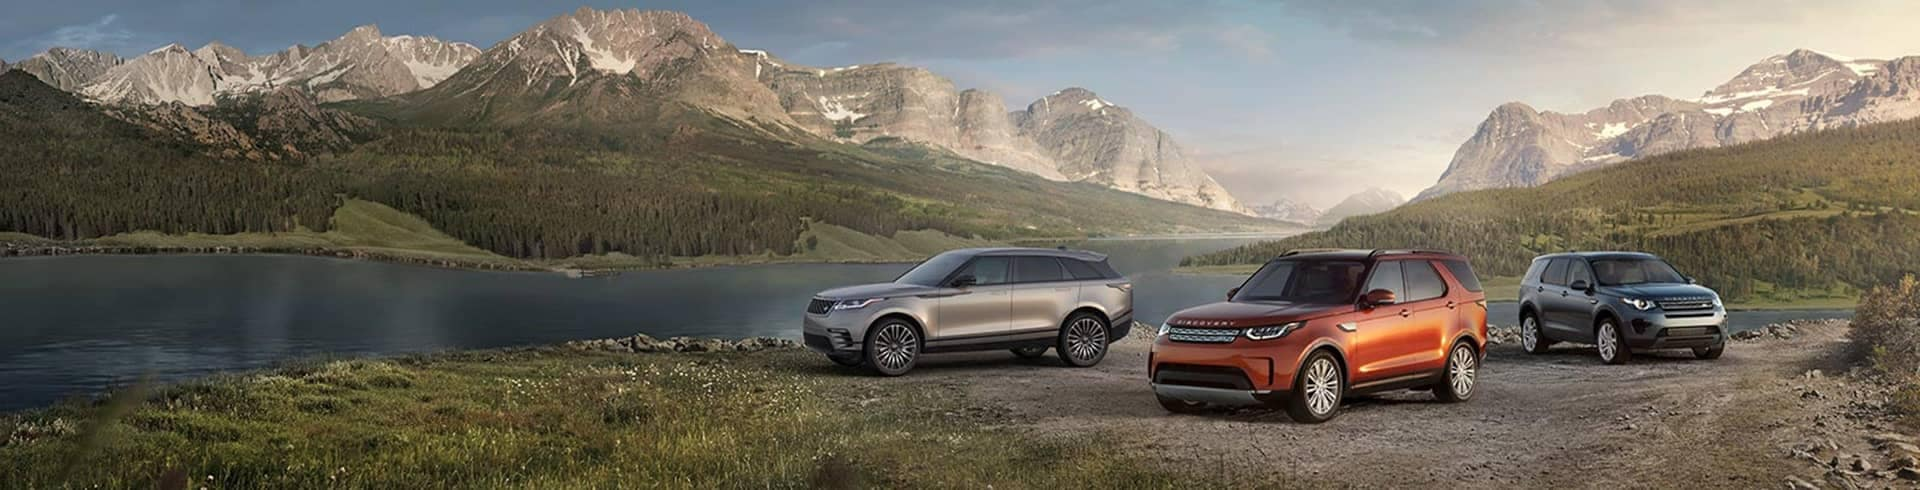 2019 Land Rover vehicles near mountain lake